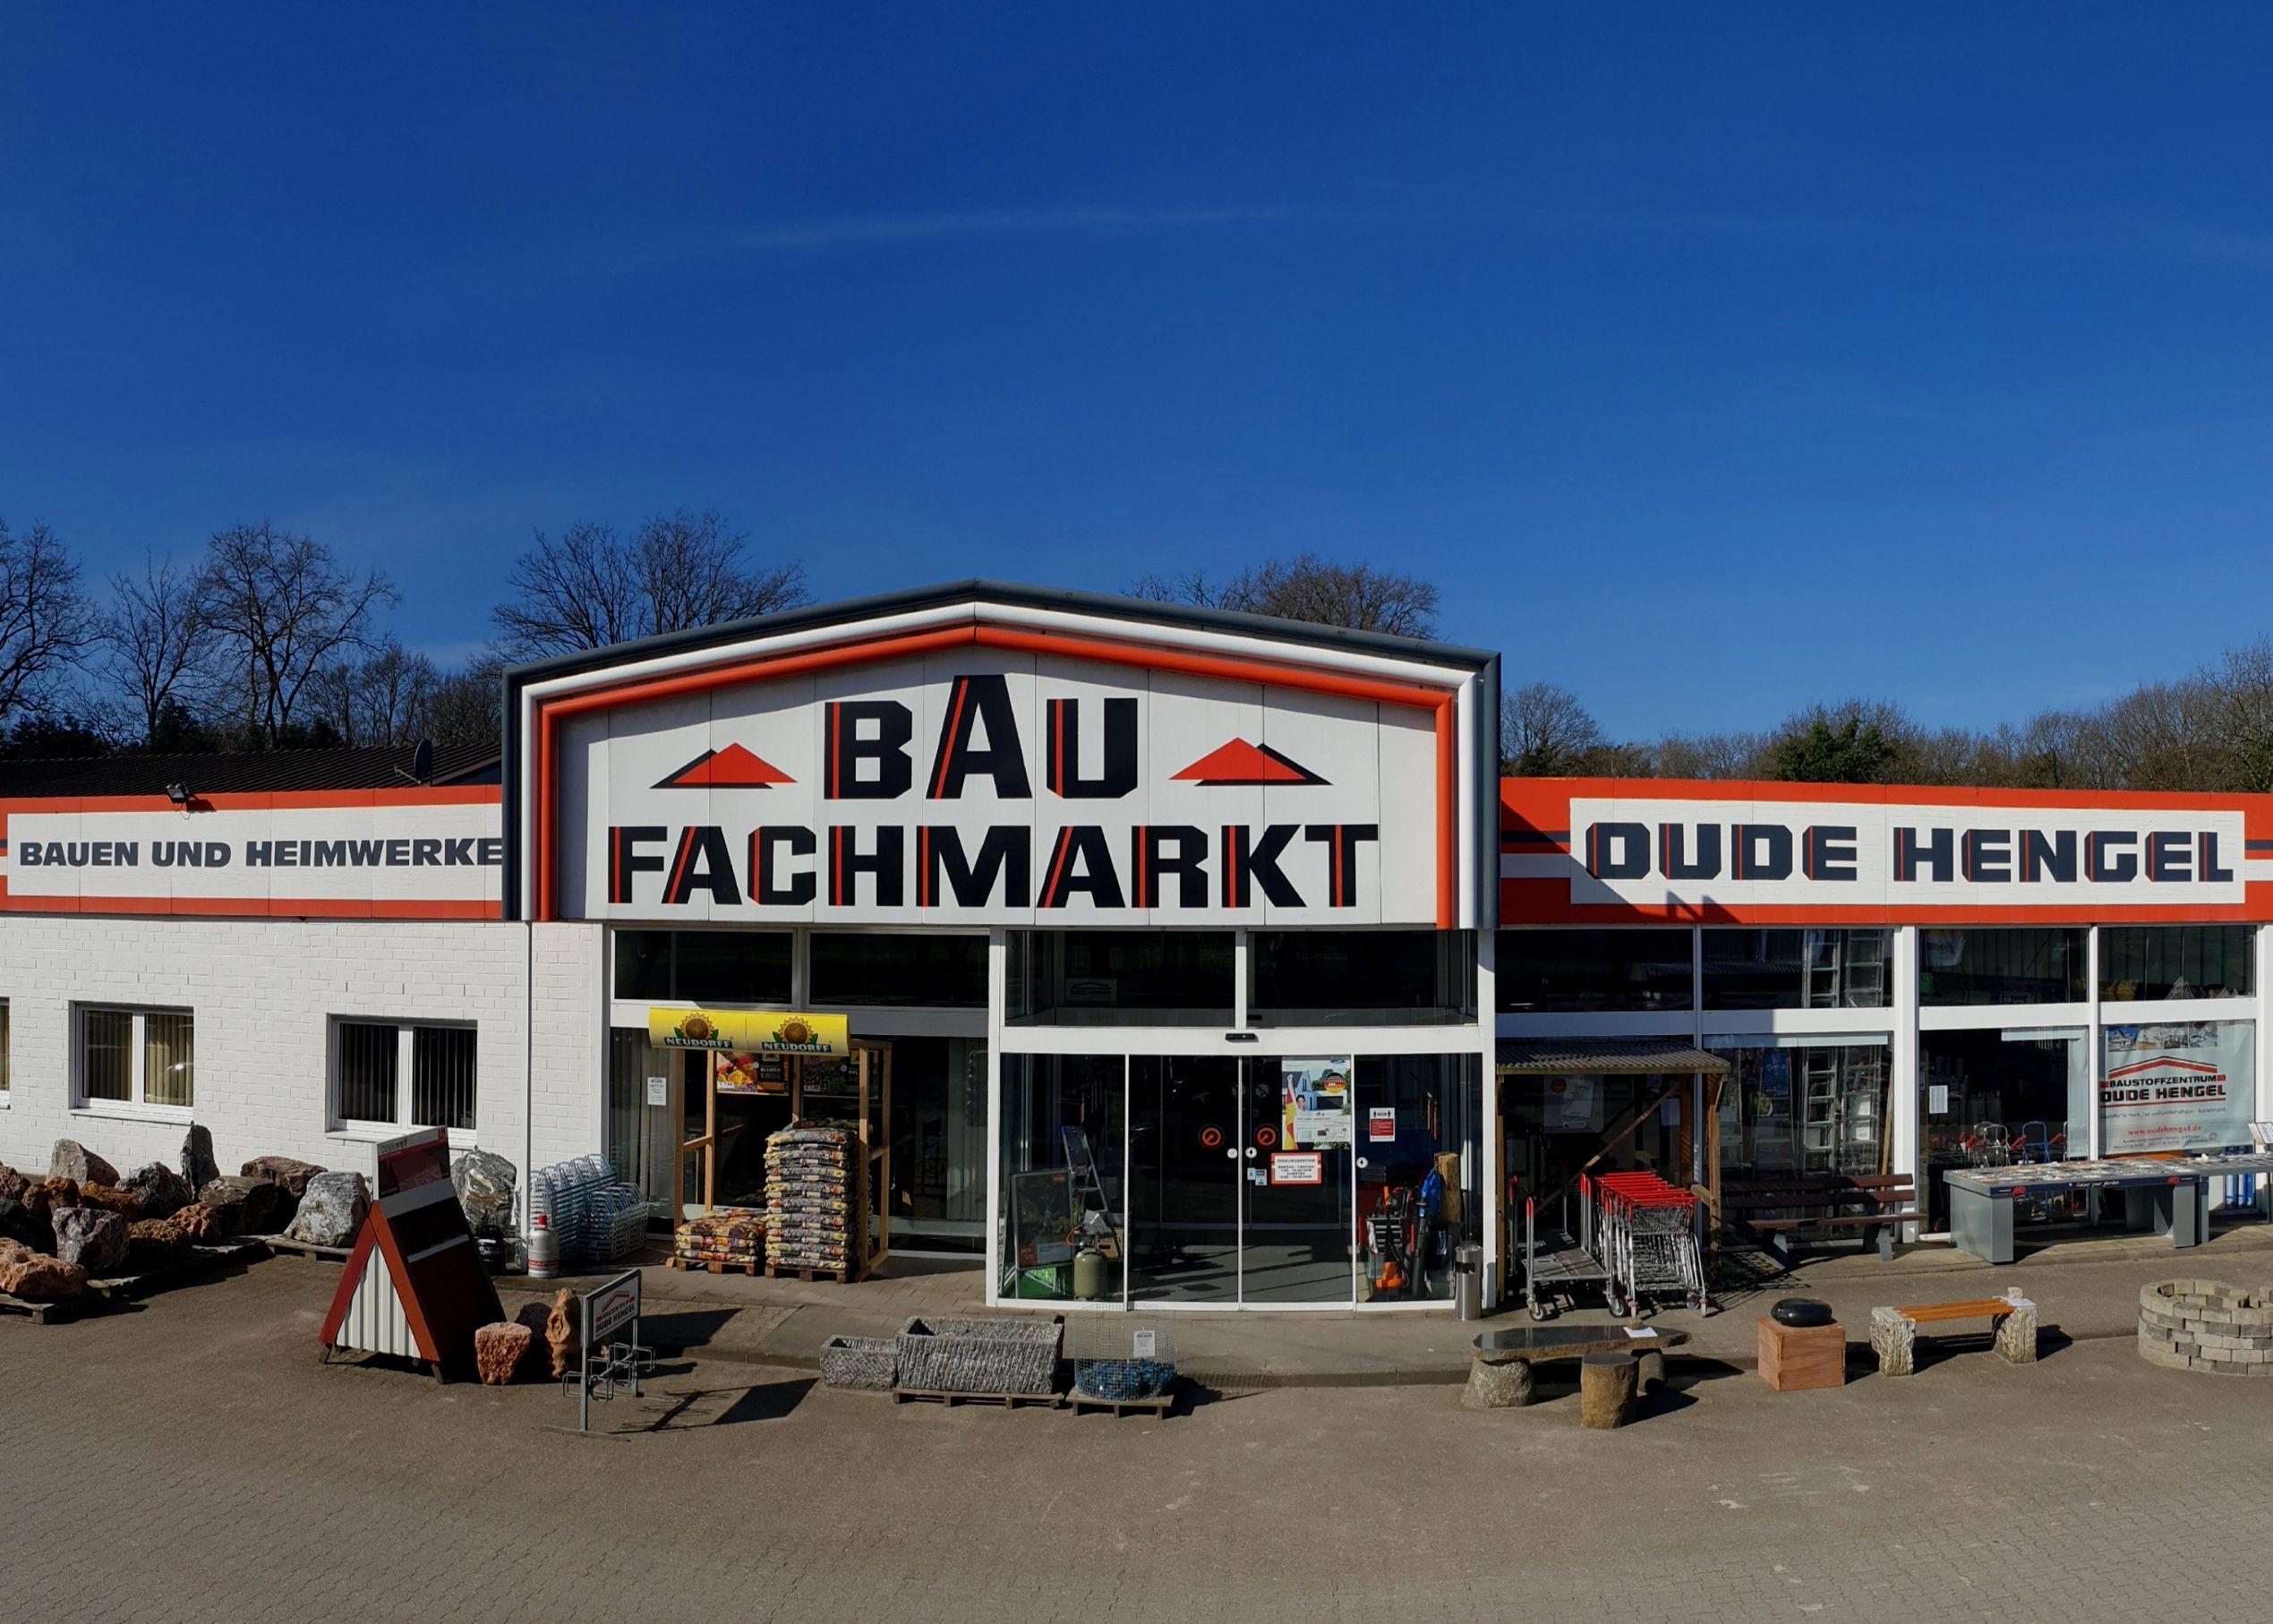 Baustoffzentrum Oude Hengel